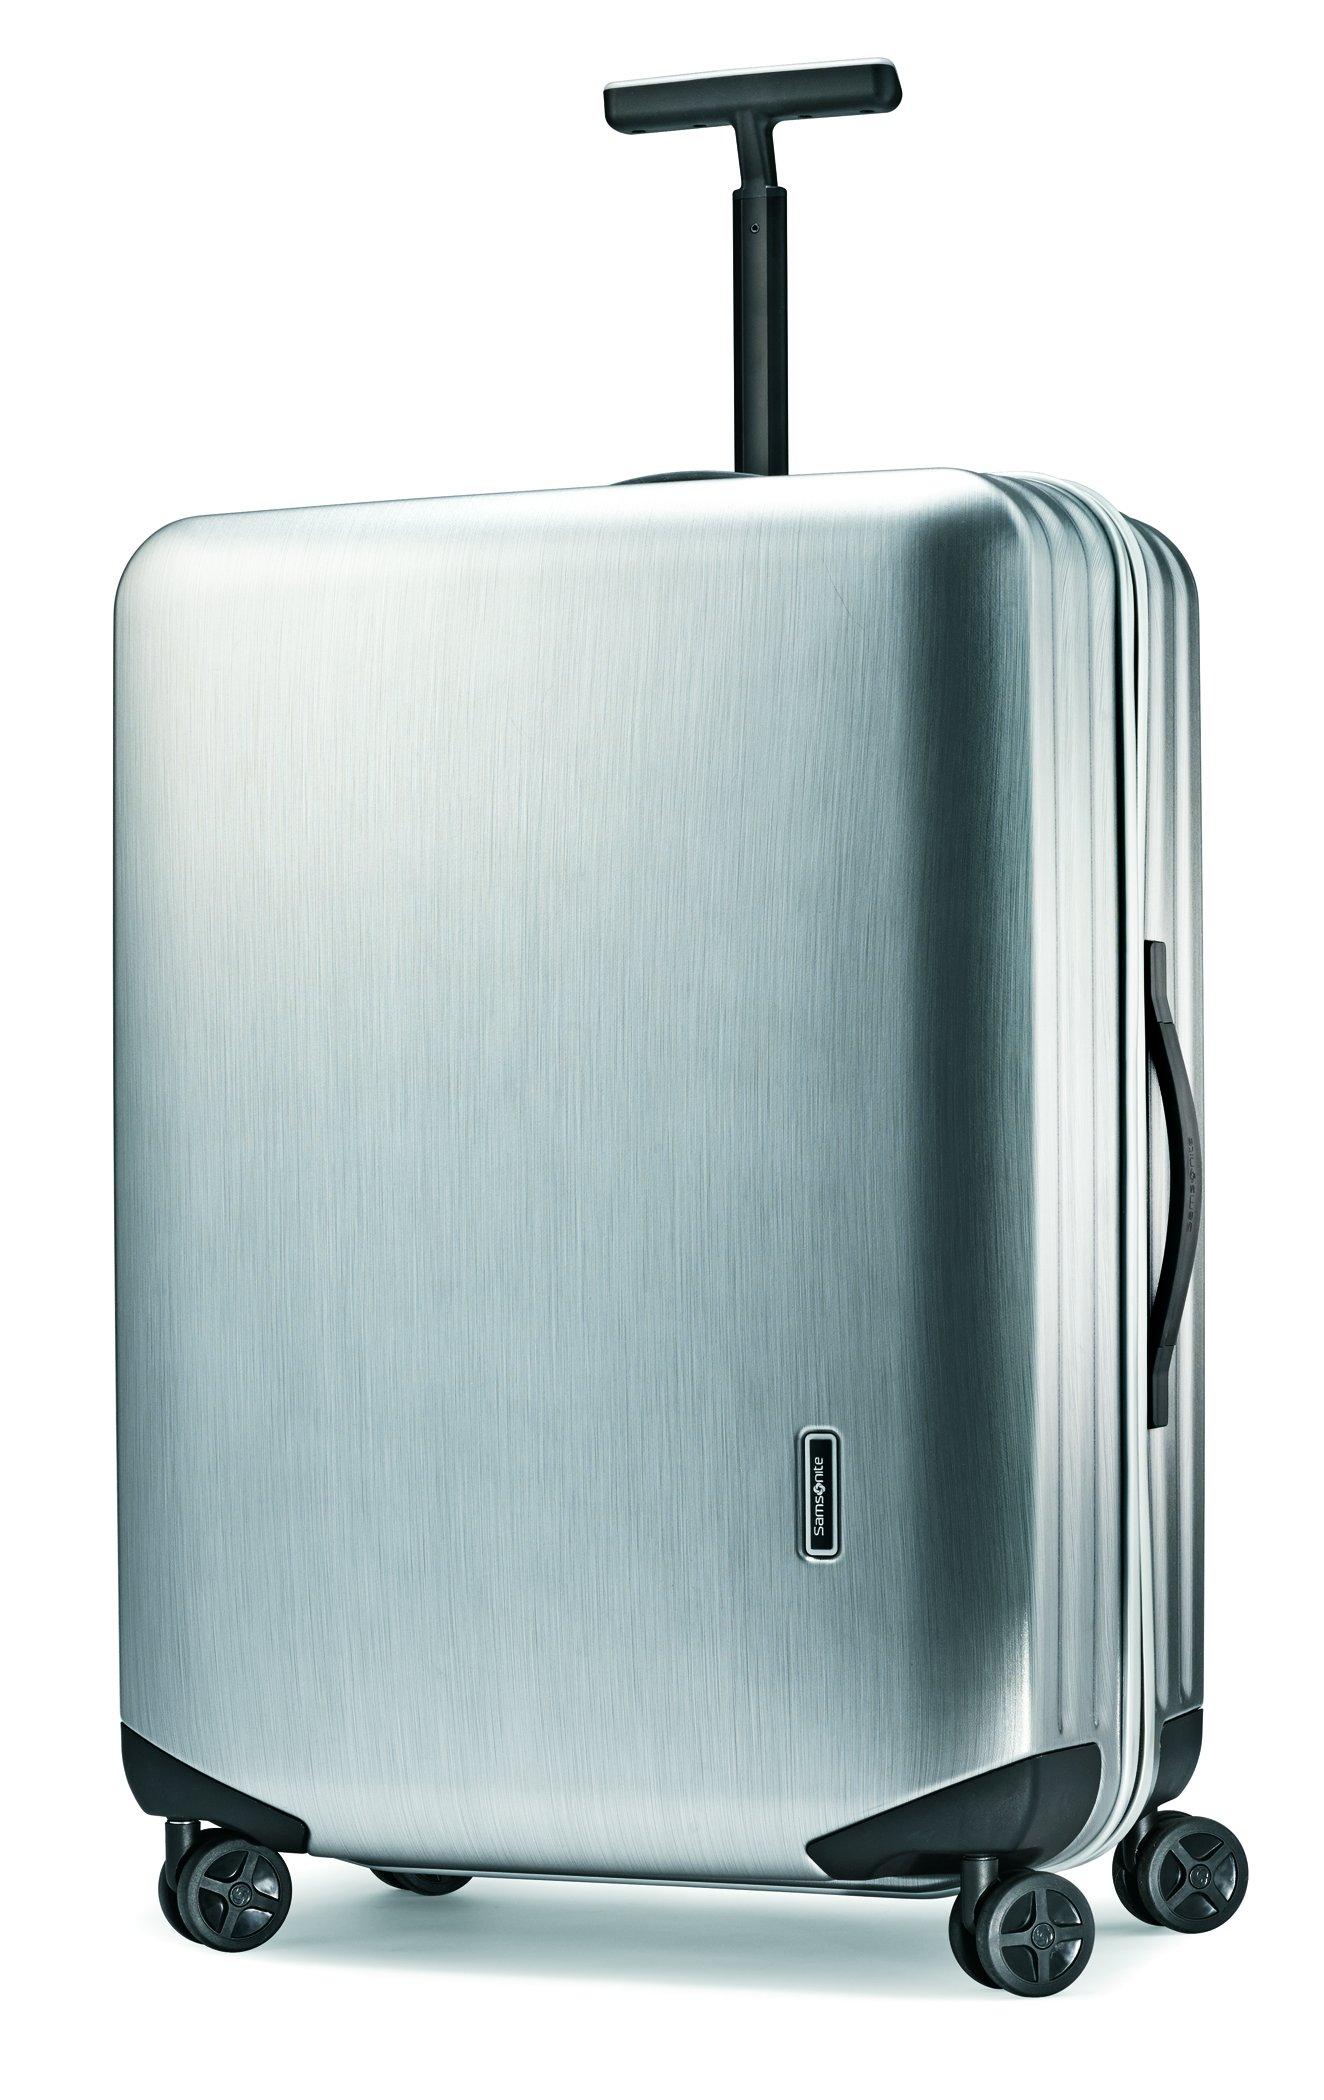 Samsonite Inova Hardside Luggage with Spinner Wheels, Metallic Silver, Checked-Large 28-Inch